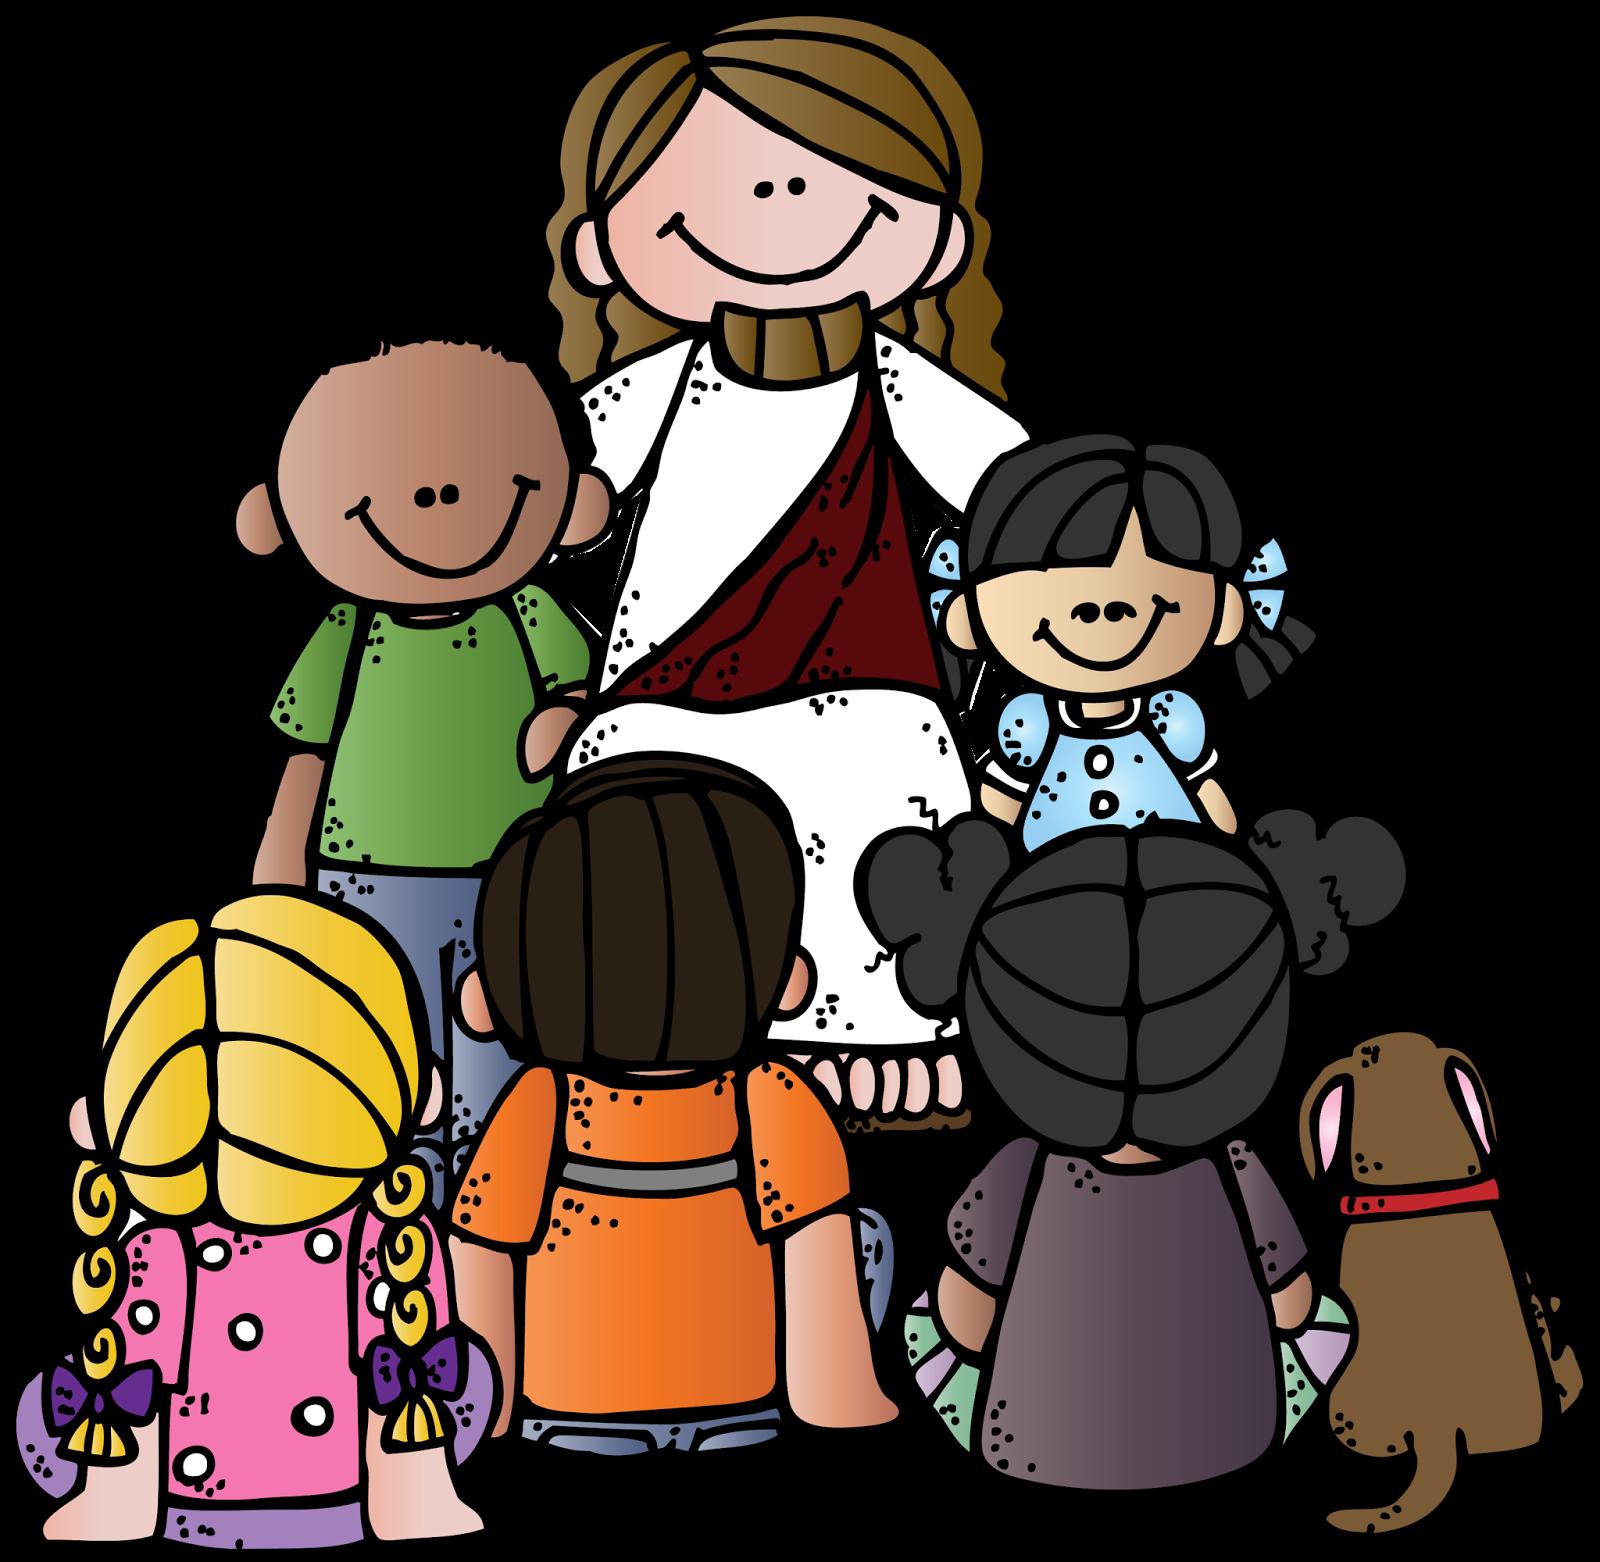 Clipart world jesus loves the little child. Melonheadz lds illustrating general